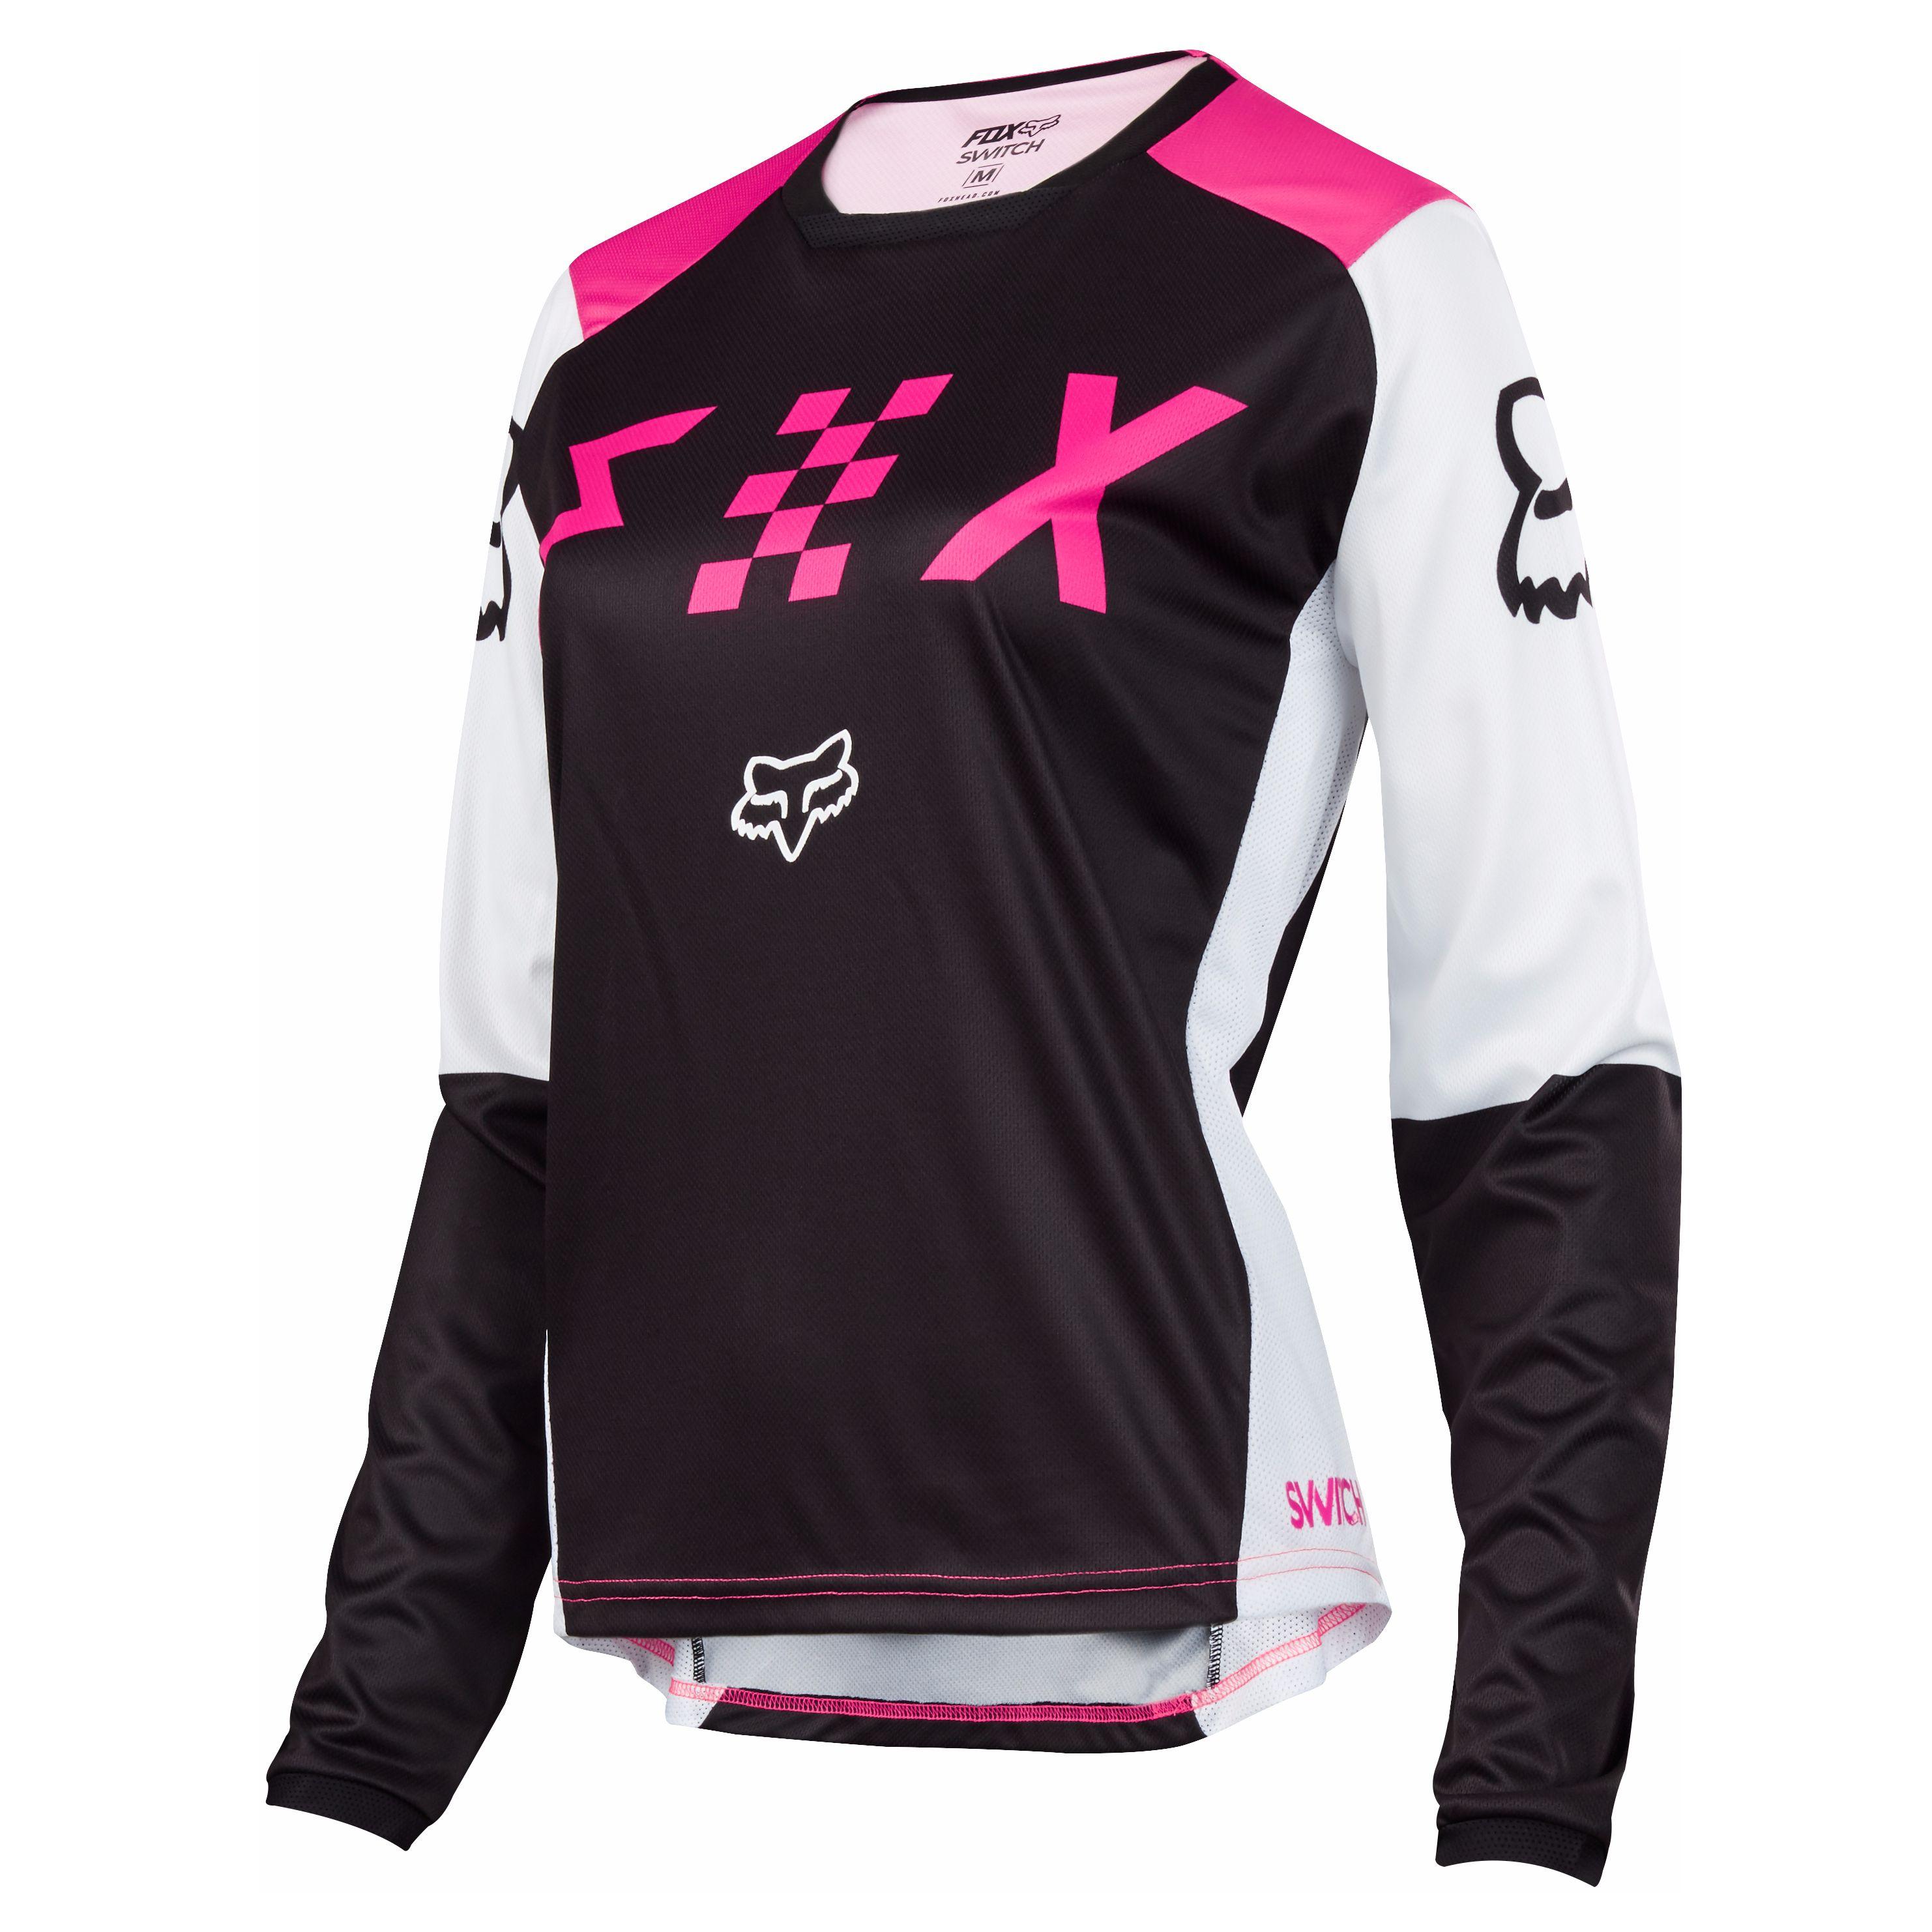 Camiseta de motocross Fox WOMAN SWITCH - NEGRO ROSA- 2018 - Motoblouz.es 7ff52fd9e19